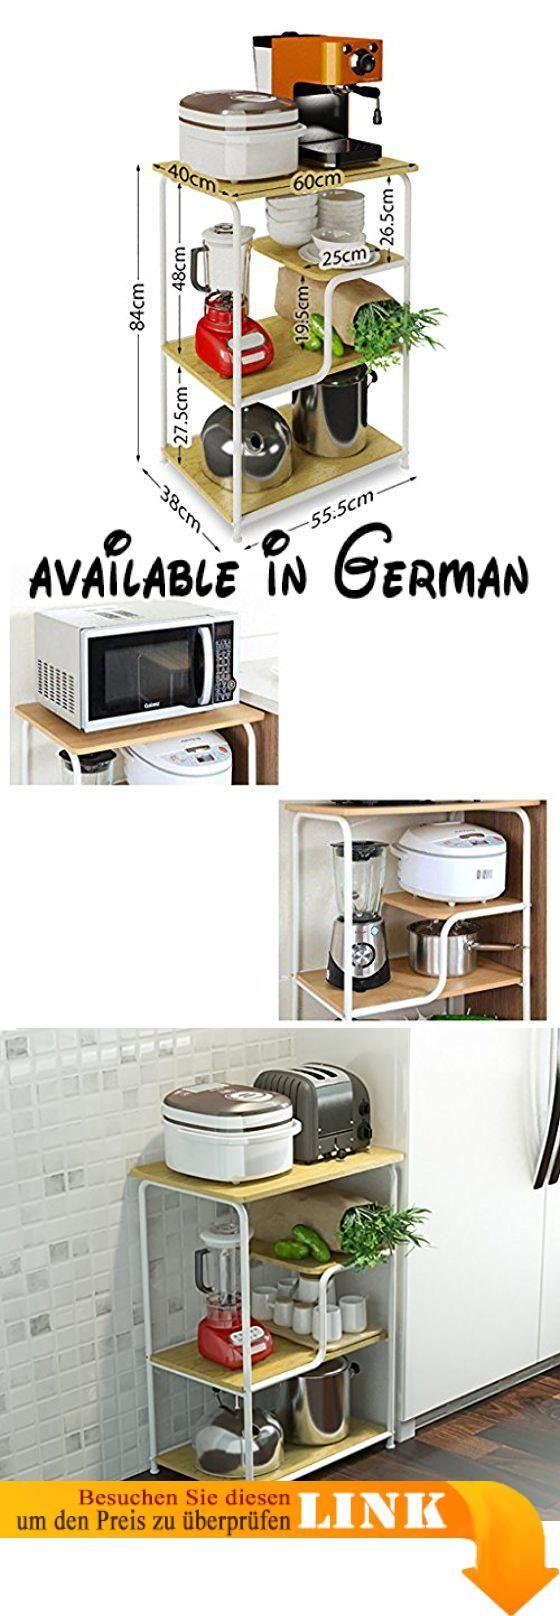 B078V2WJ9Q : Küche-Regal-Boden-Mikrowellen-Speicher-Regal 4-stöckige ...